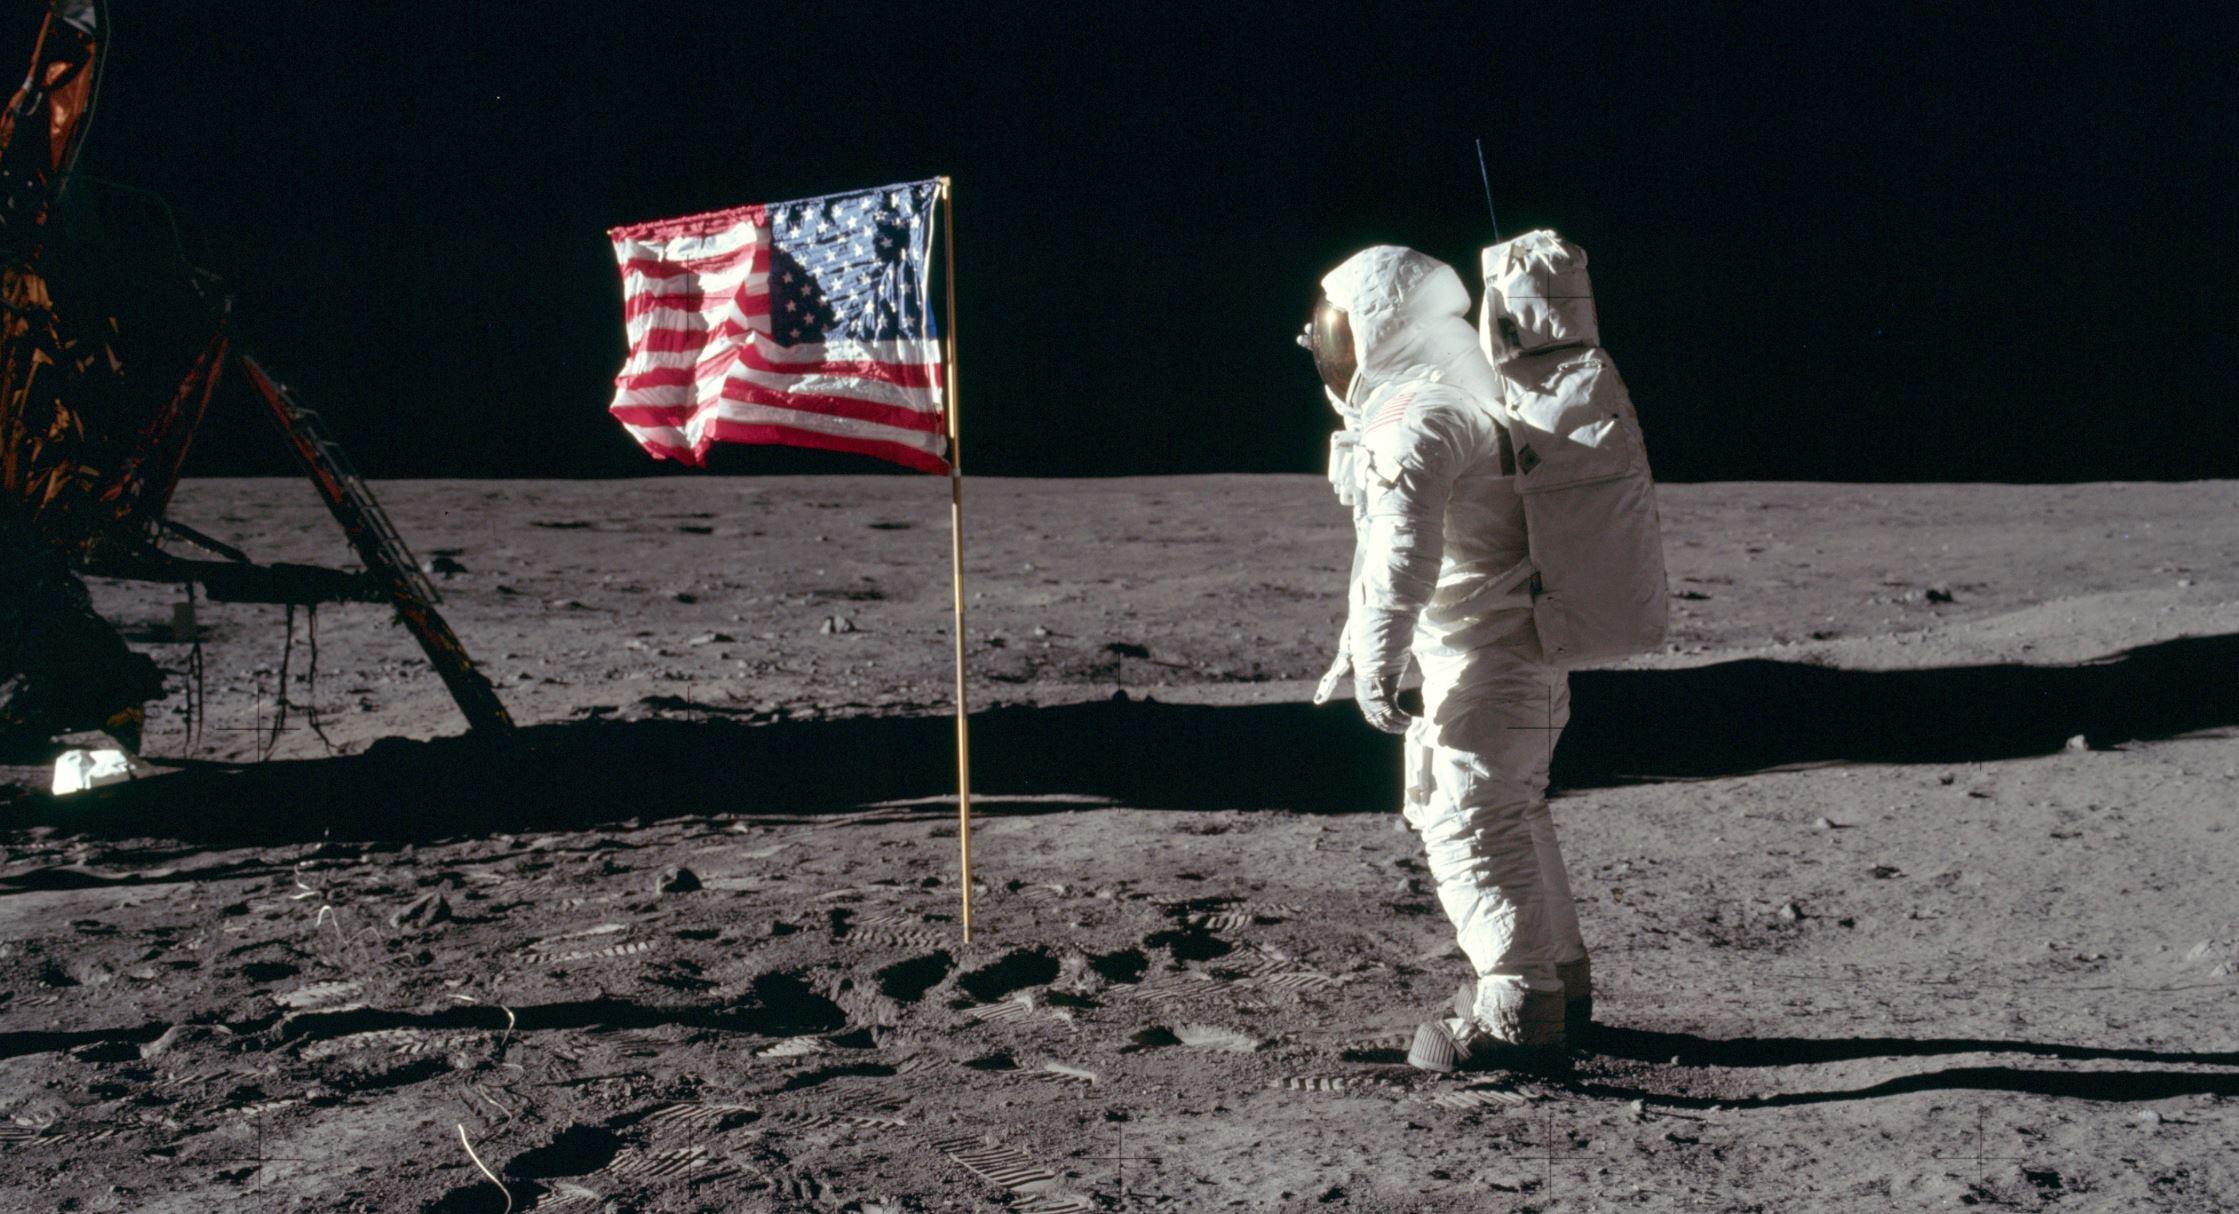 Image Credit:  NASA / Neil A. Armstrong via Wikimedia Commons